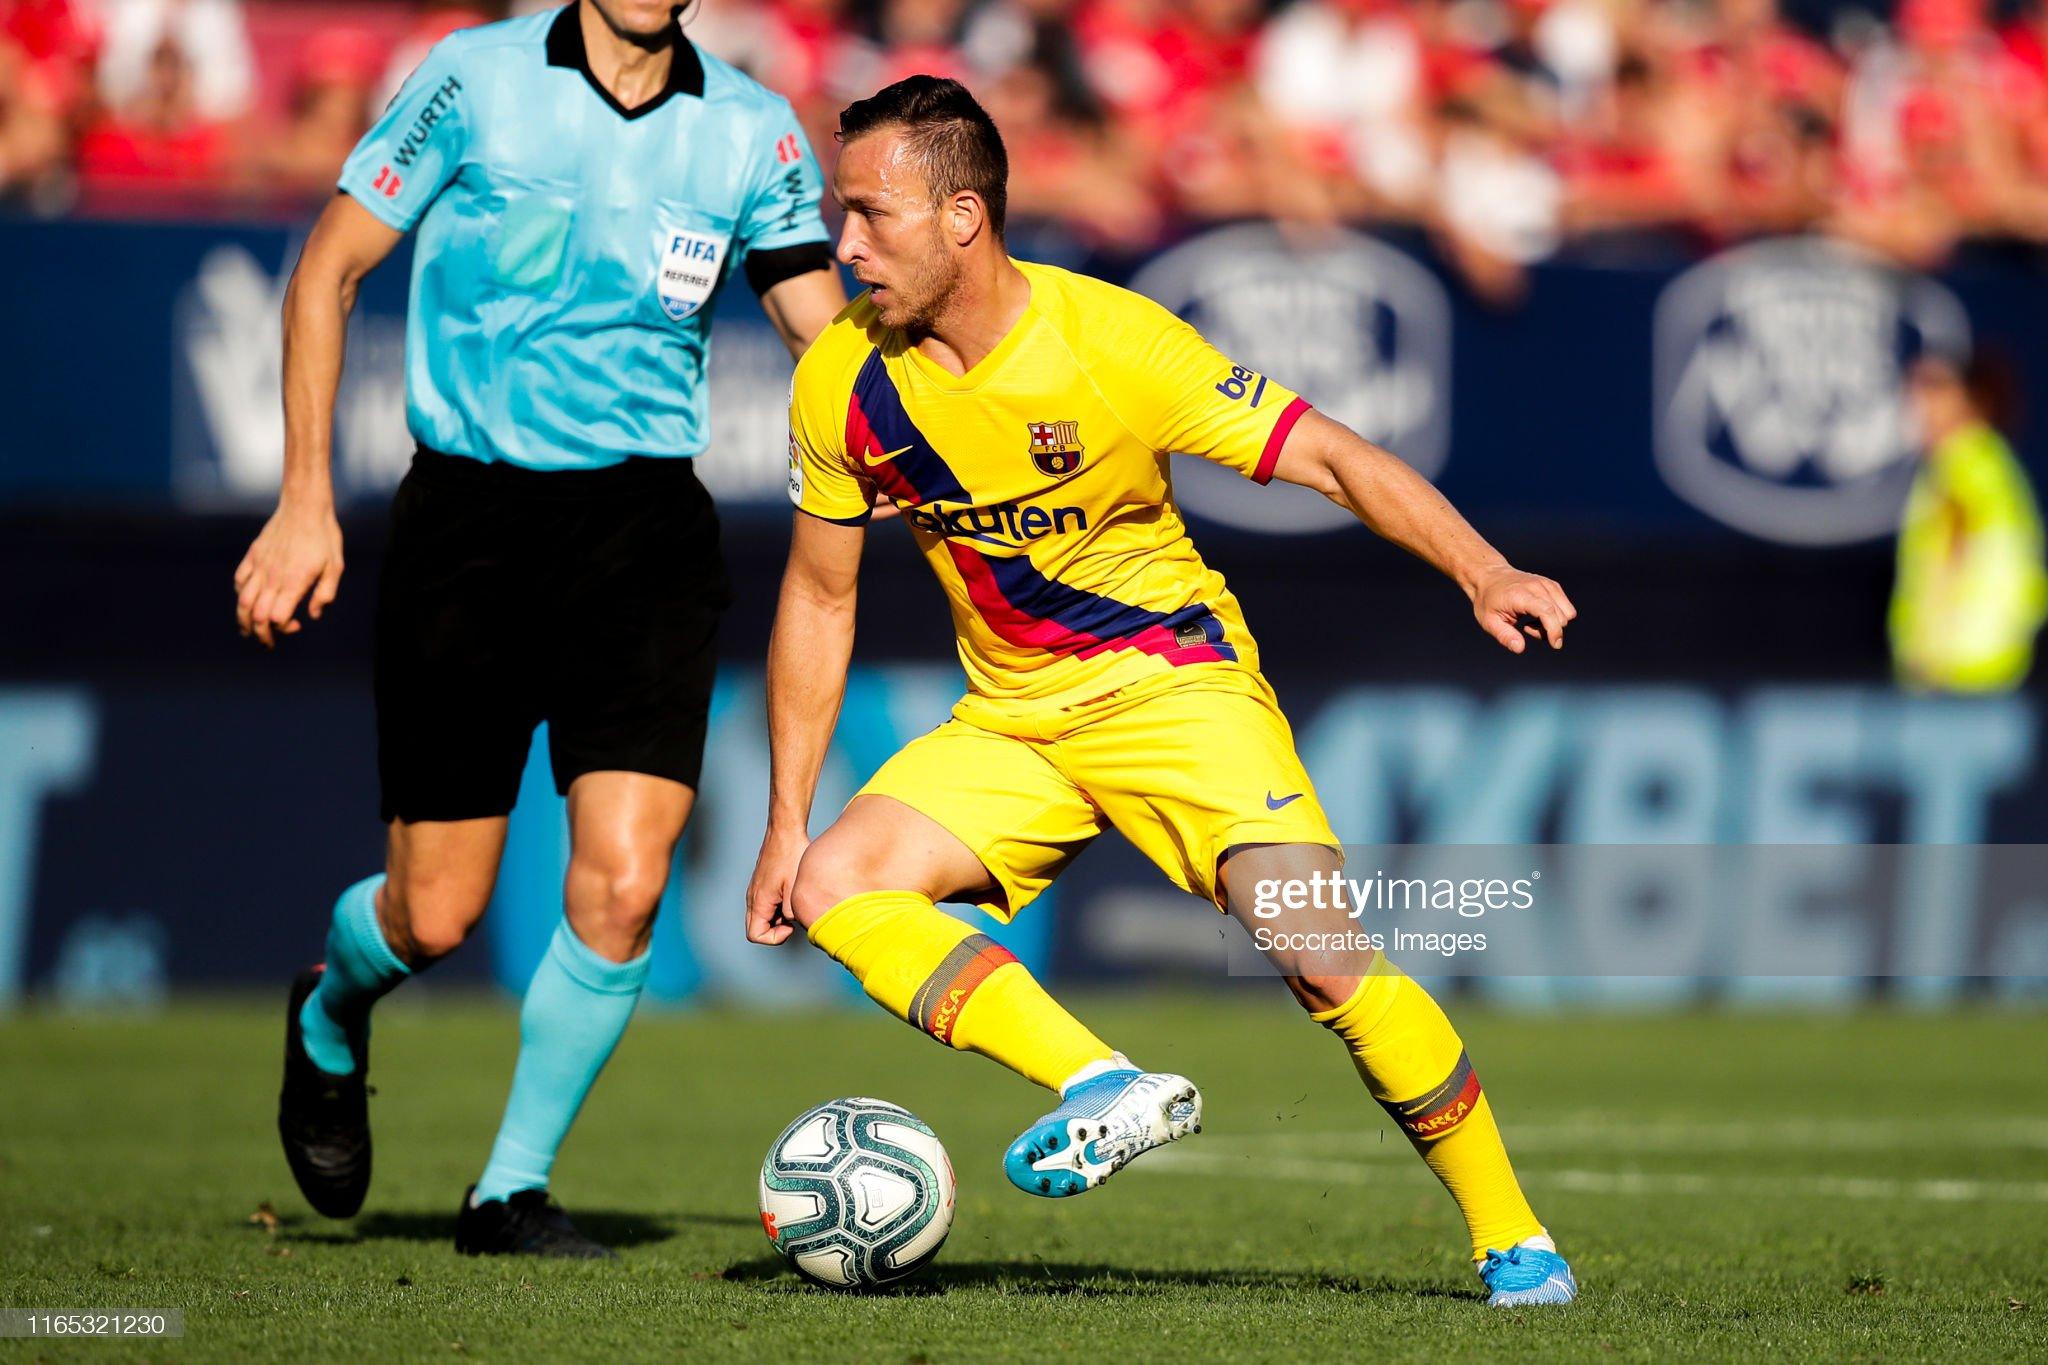 صور مباراة : أوساسونا - برشلونة 2-2 ( 31-08-2019 )  Arthur-of-fc-barcelona-during-the-la-liga-santander-match-between-v-picture-id1165321230?s=2048x2048